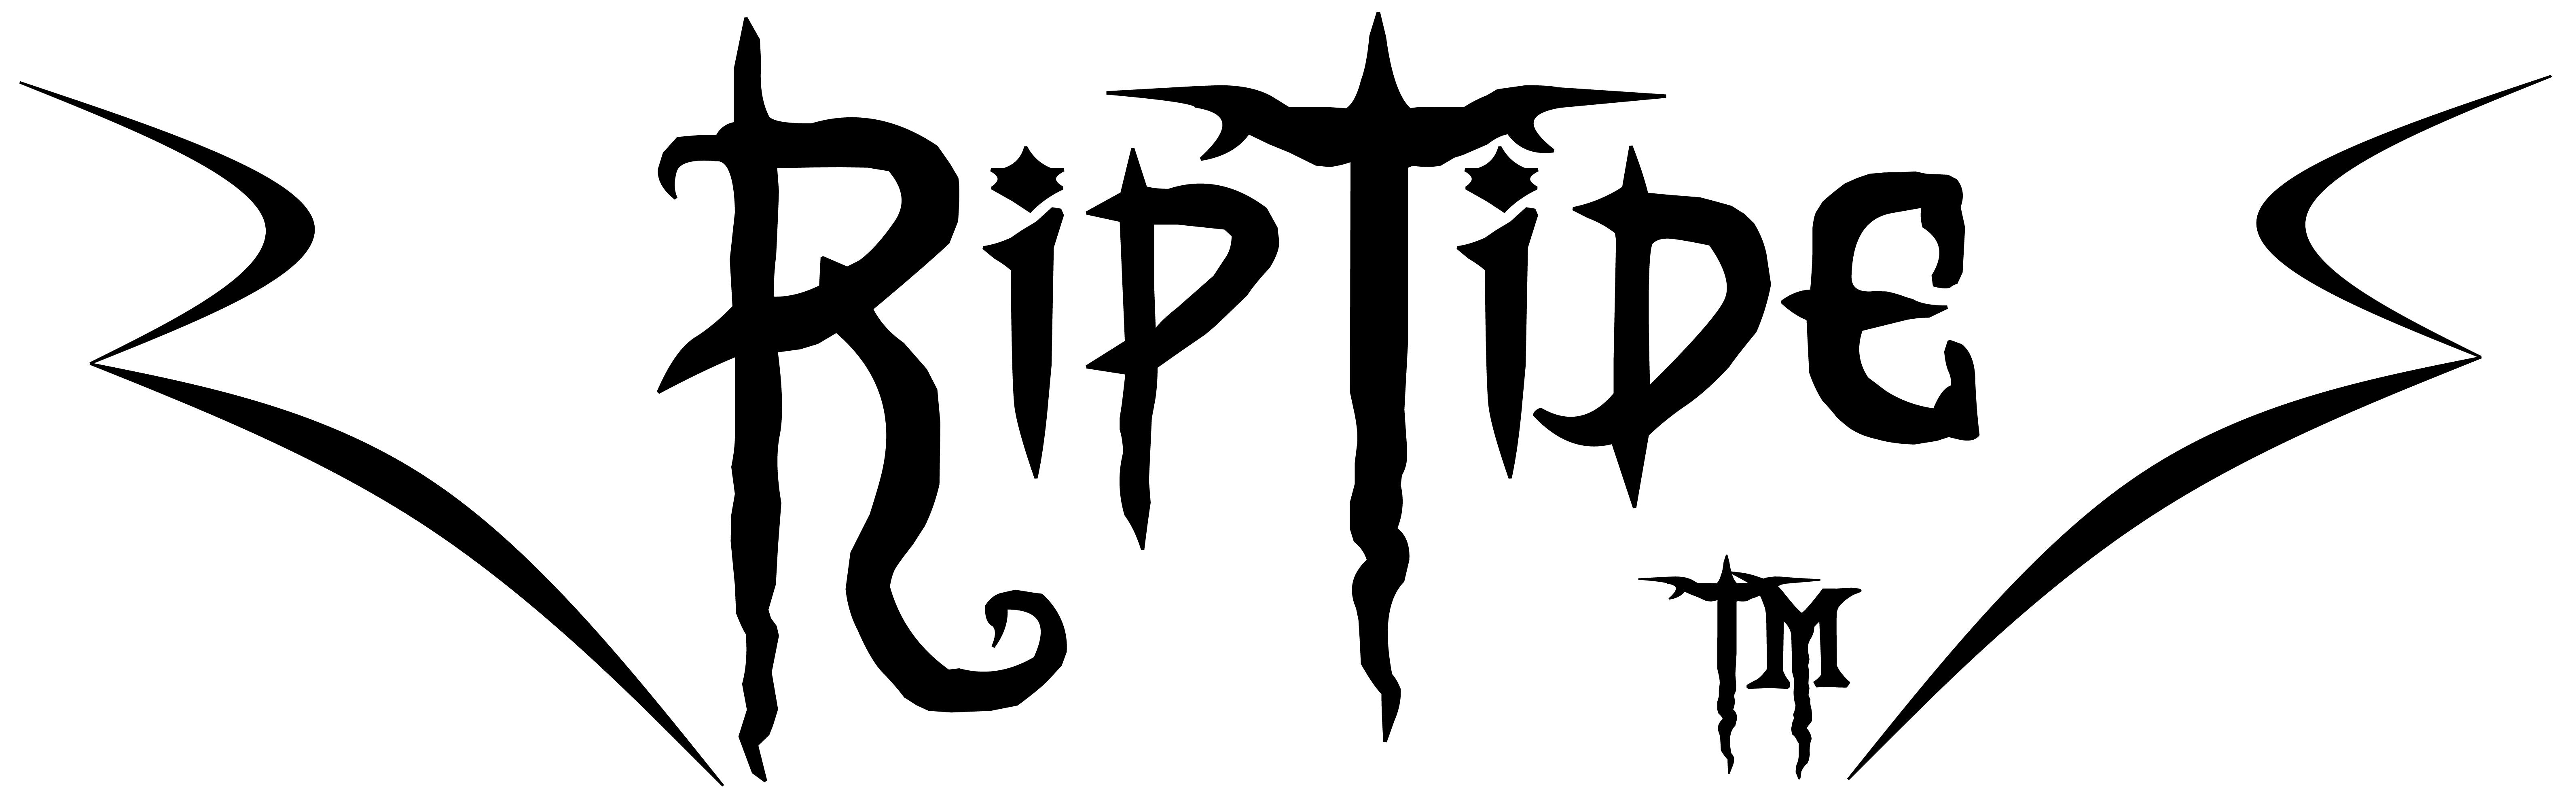 riptide-sports-logo-2016.jpg